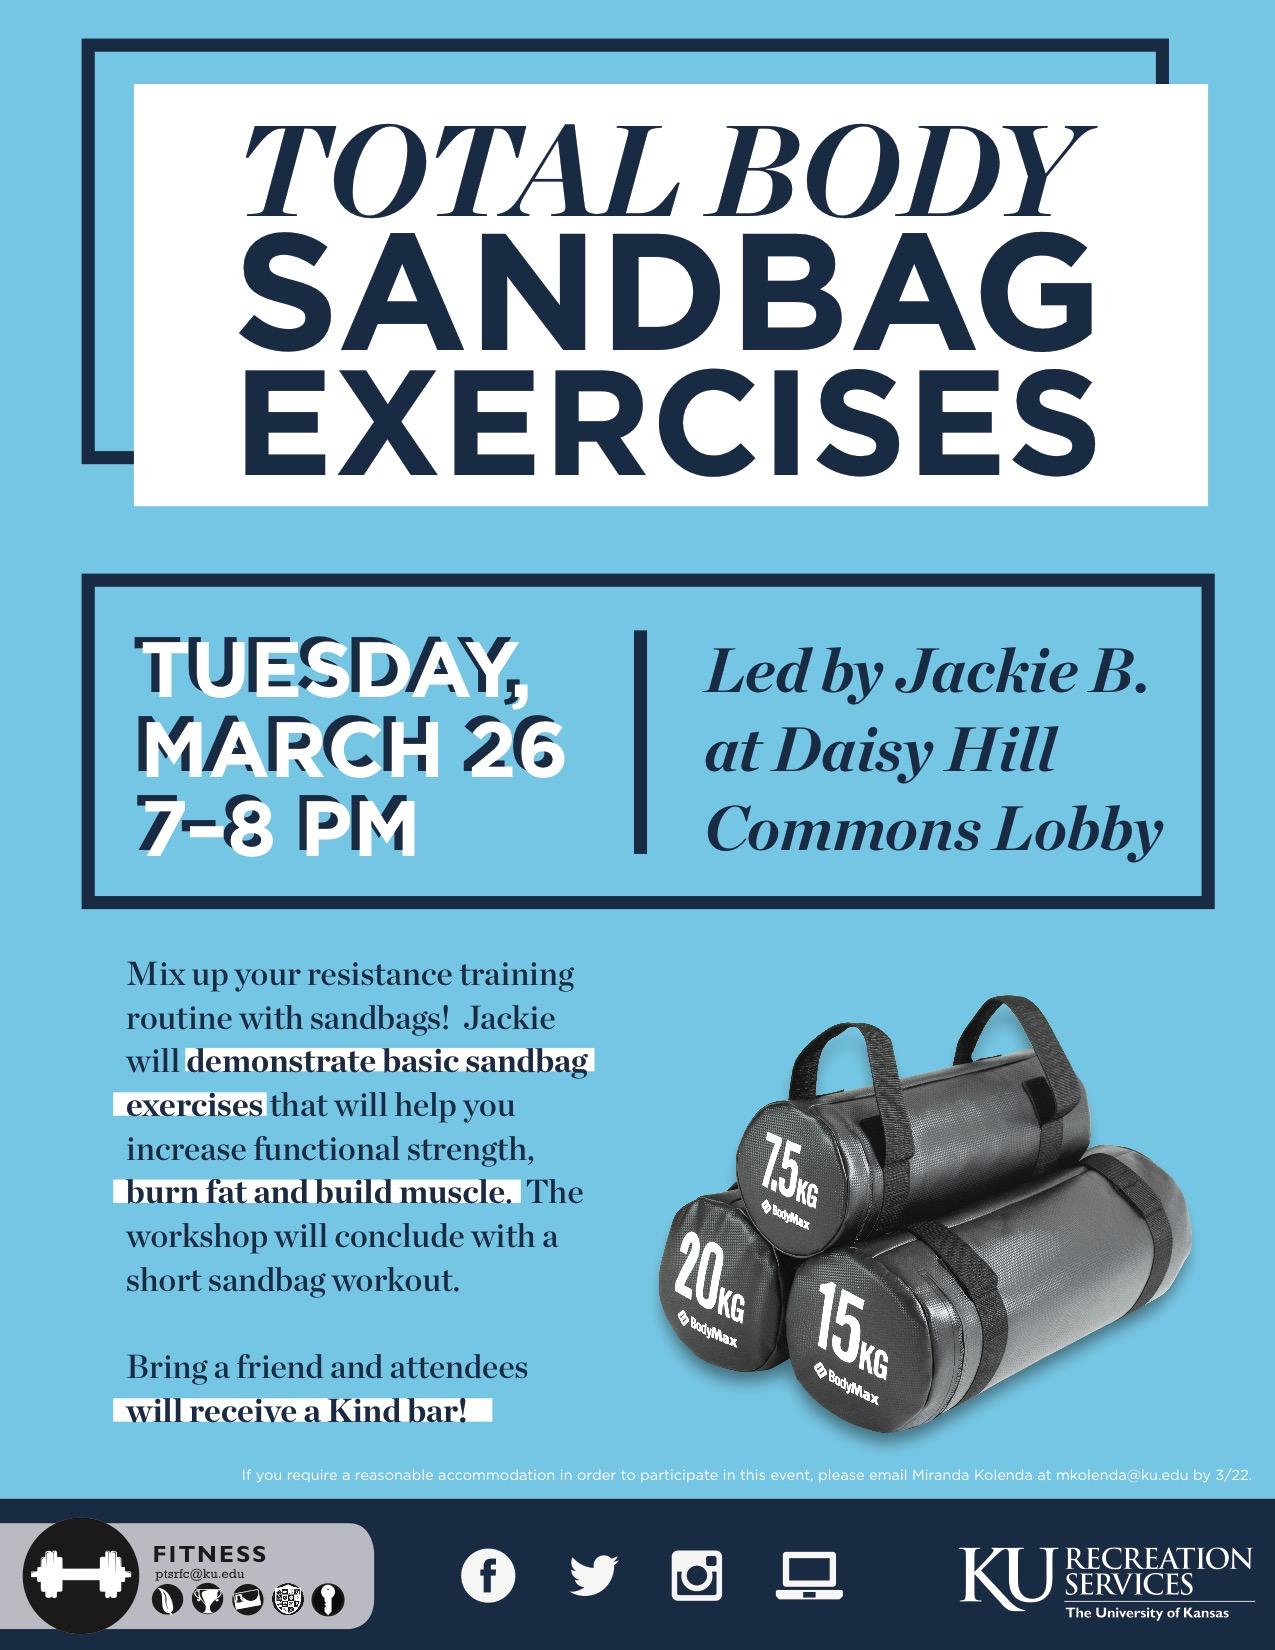 TotalBodySandbag Exercise